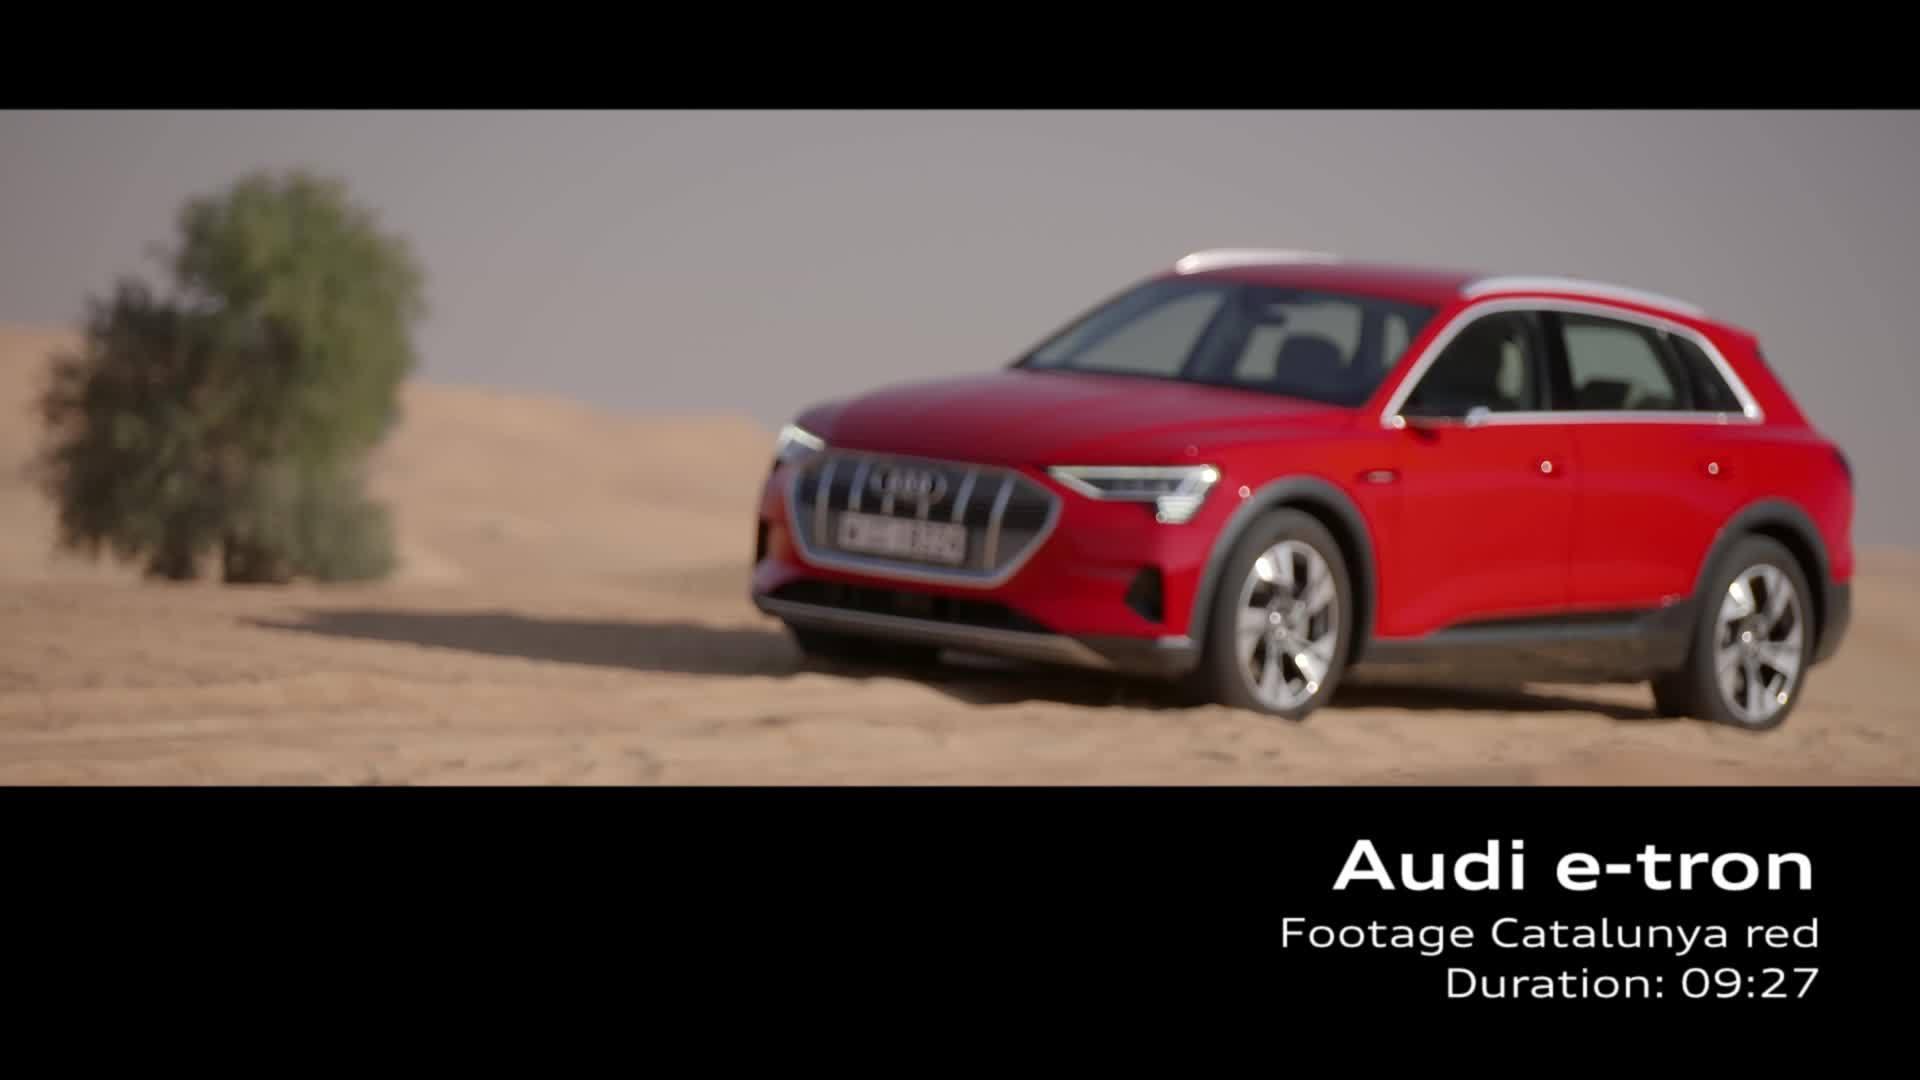 Audi e-tron Footage Catalunyarot